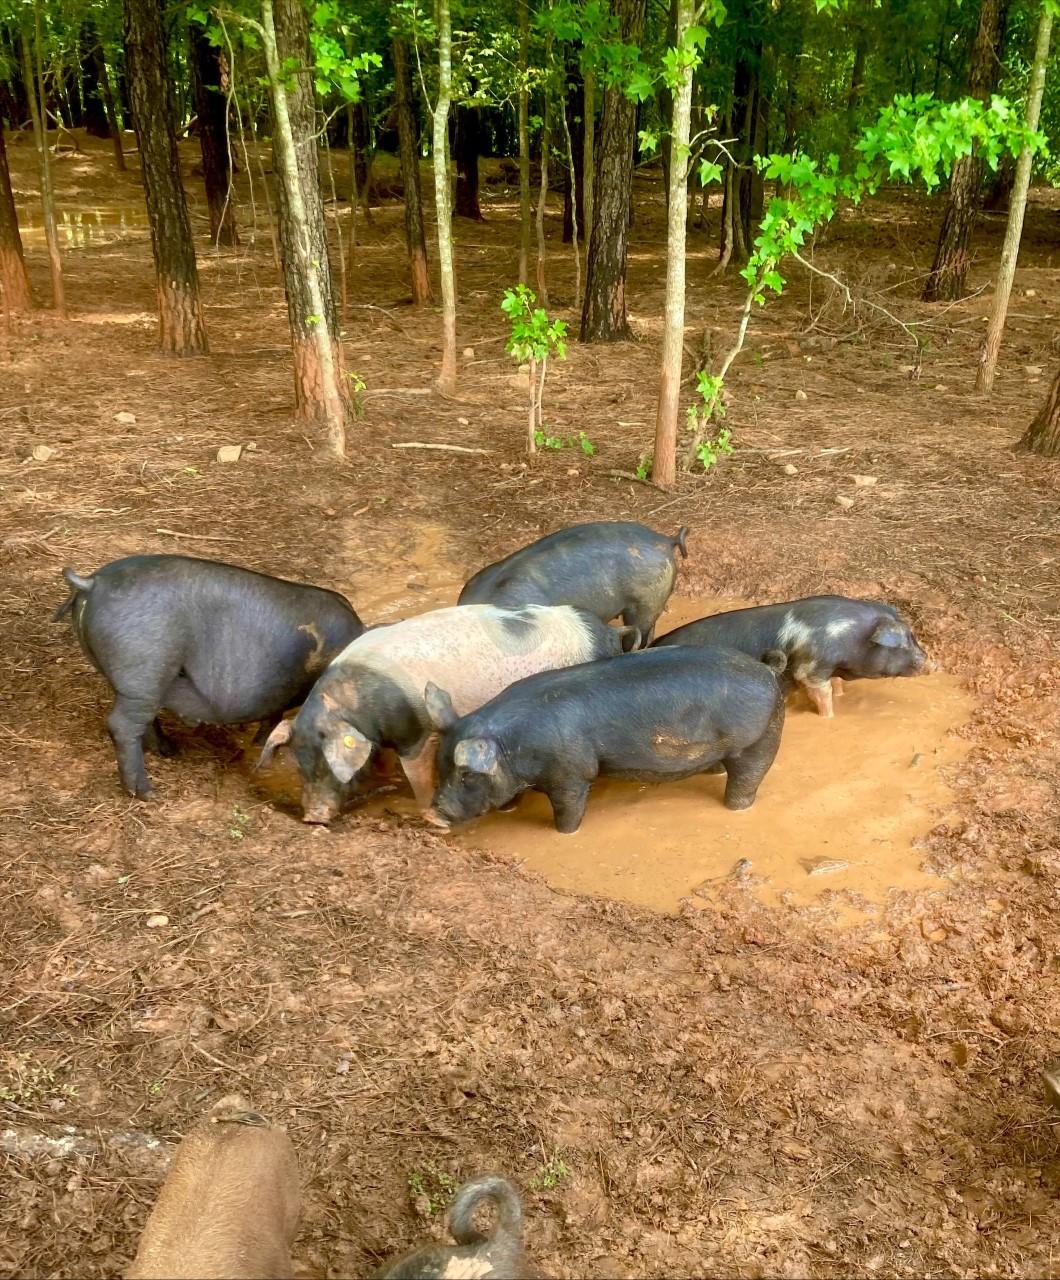 pigs happy in mud holes at our Lacrosse, VA farm